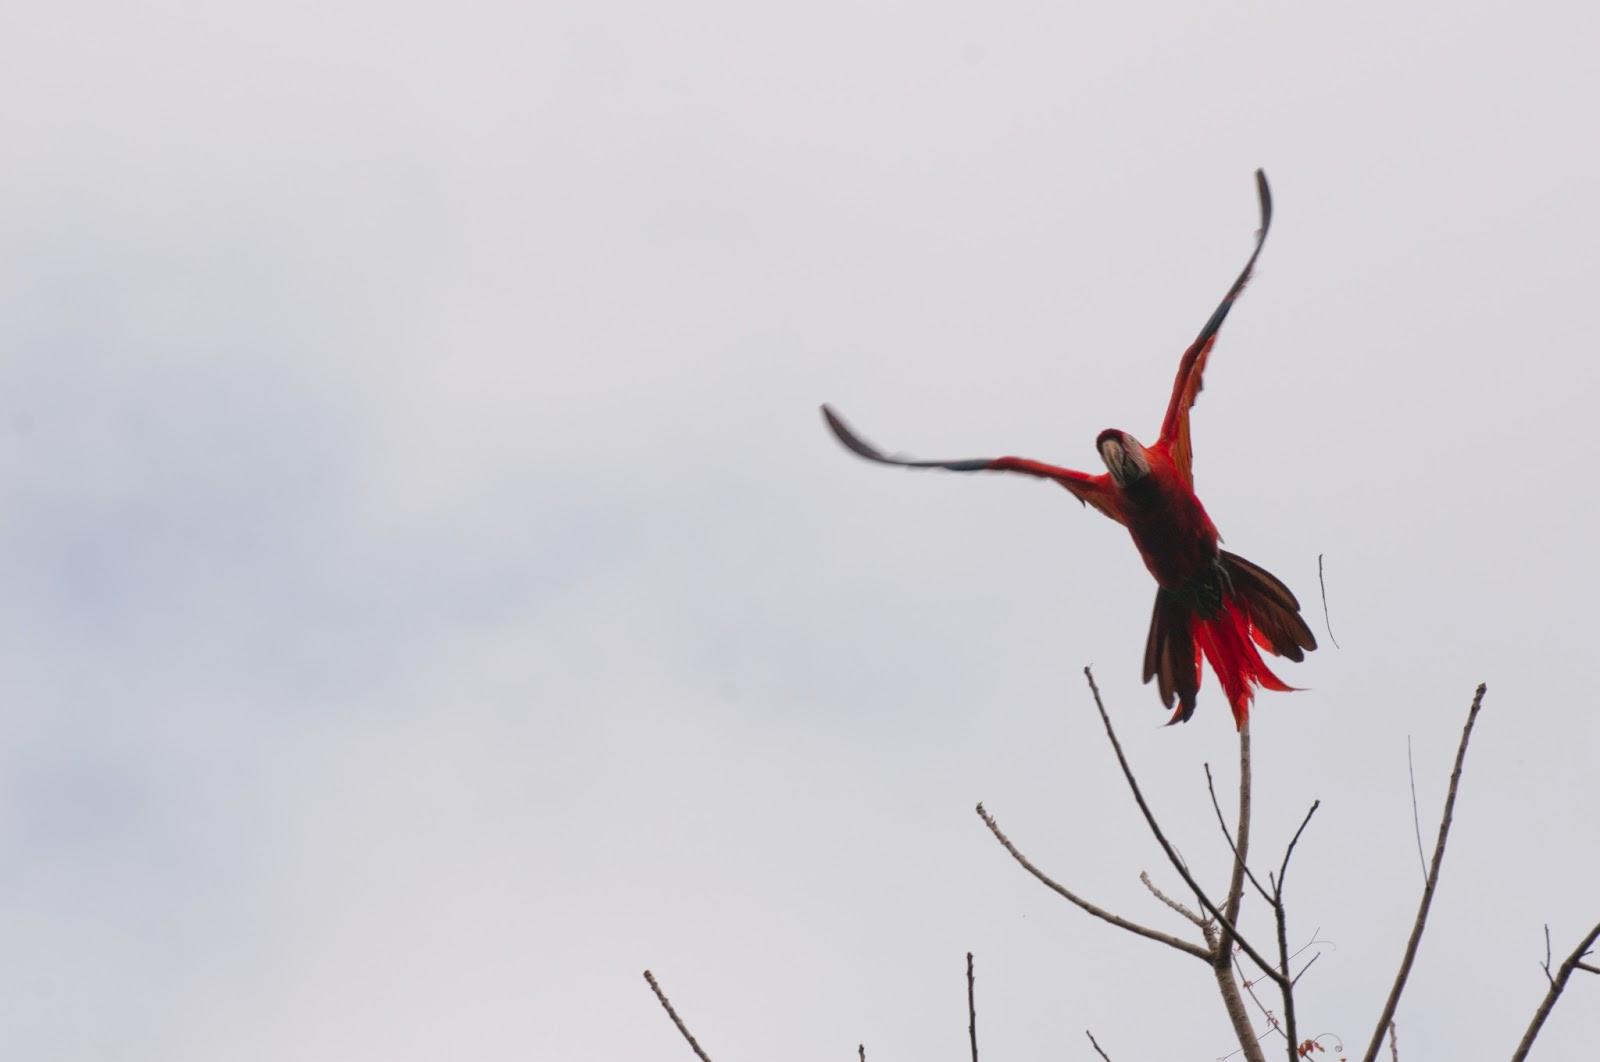 Guacamaya Roja, Ara Macao Cyanoptera, or scarlet macaw